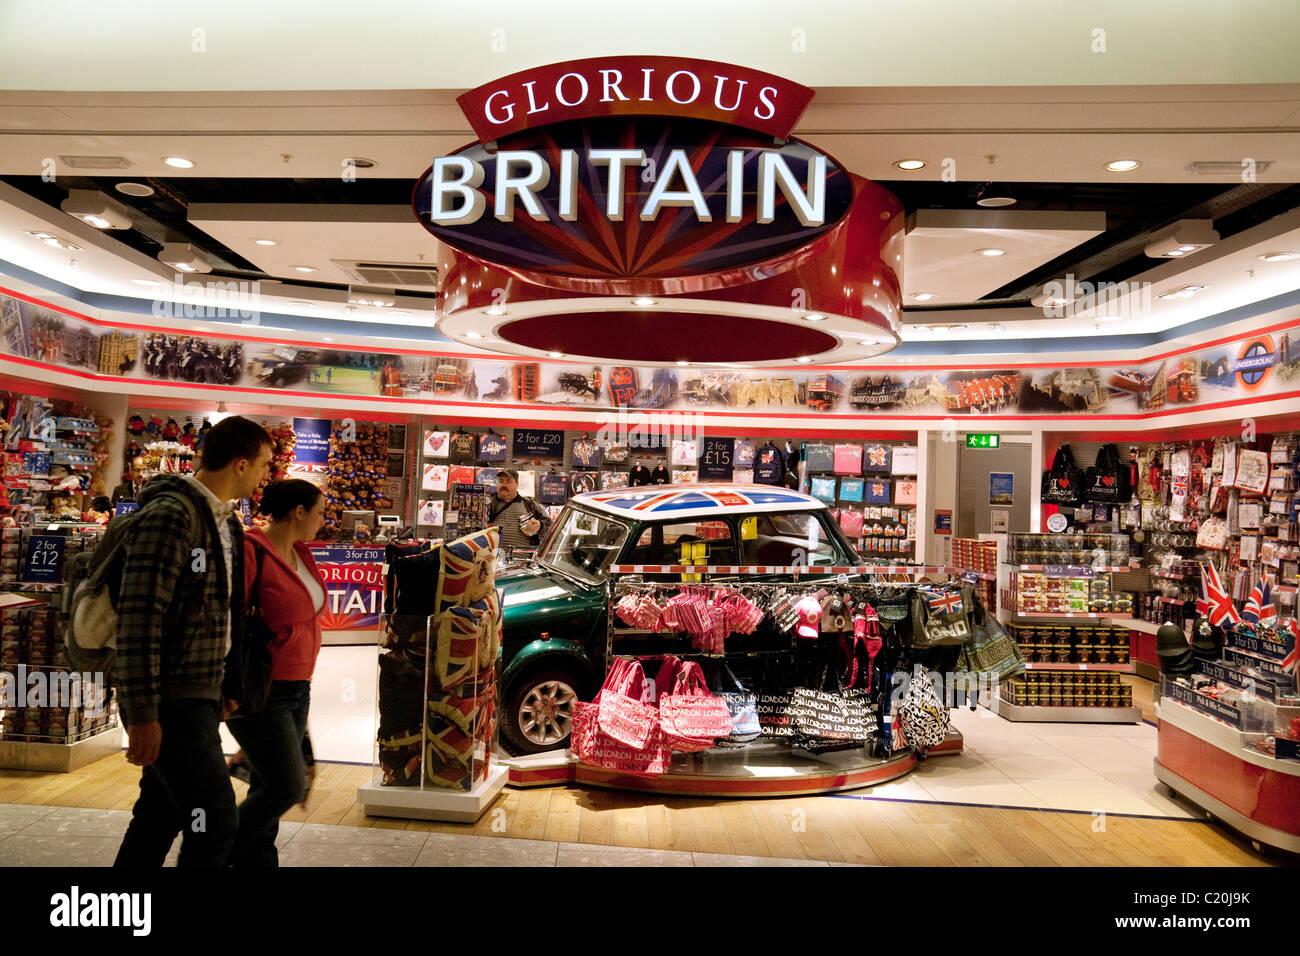 People at the 'Glorious Britain' souvenir shop, Terminal 5, heathrow airport London UK - Stock Image